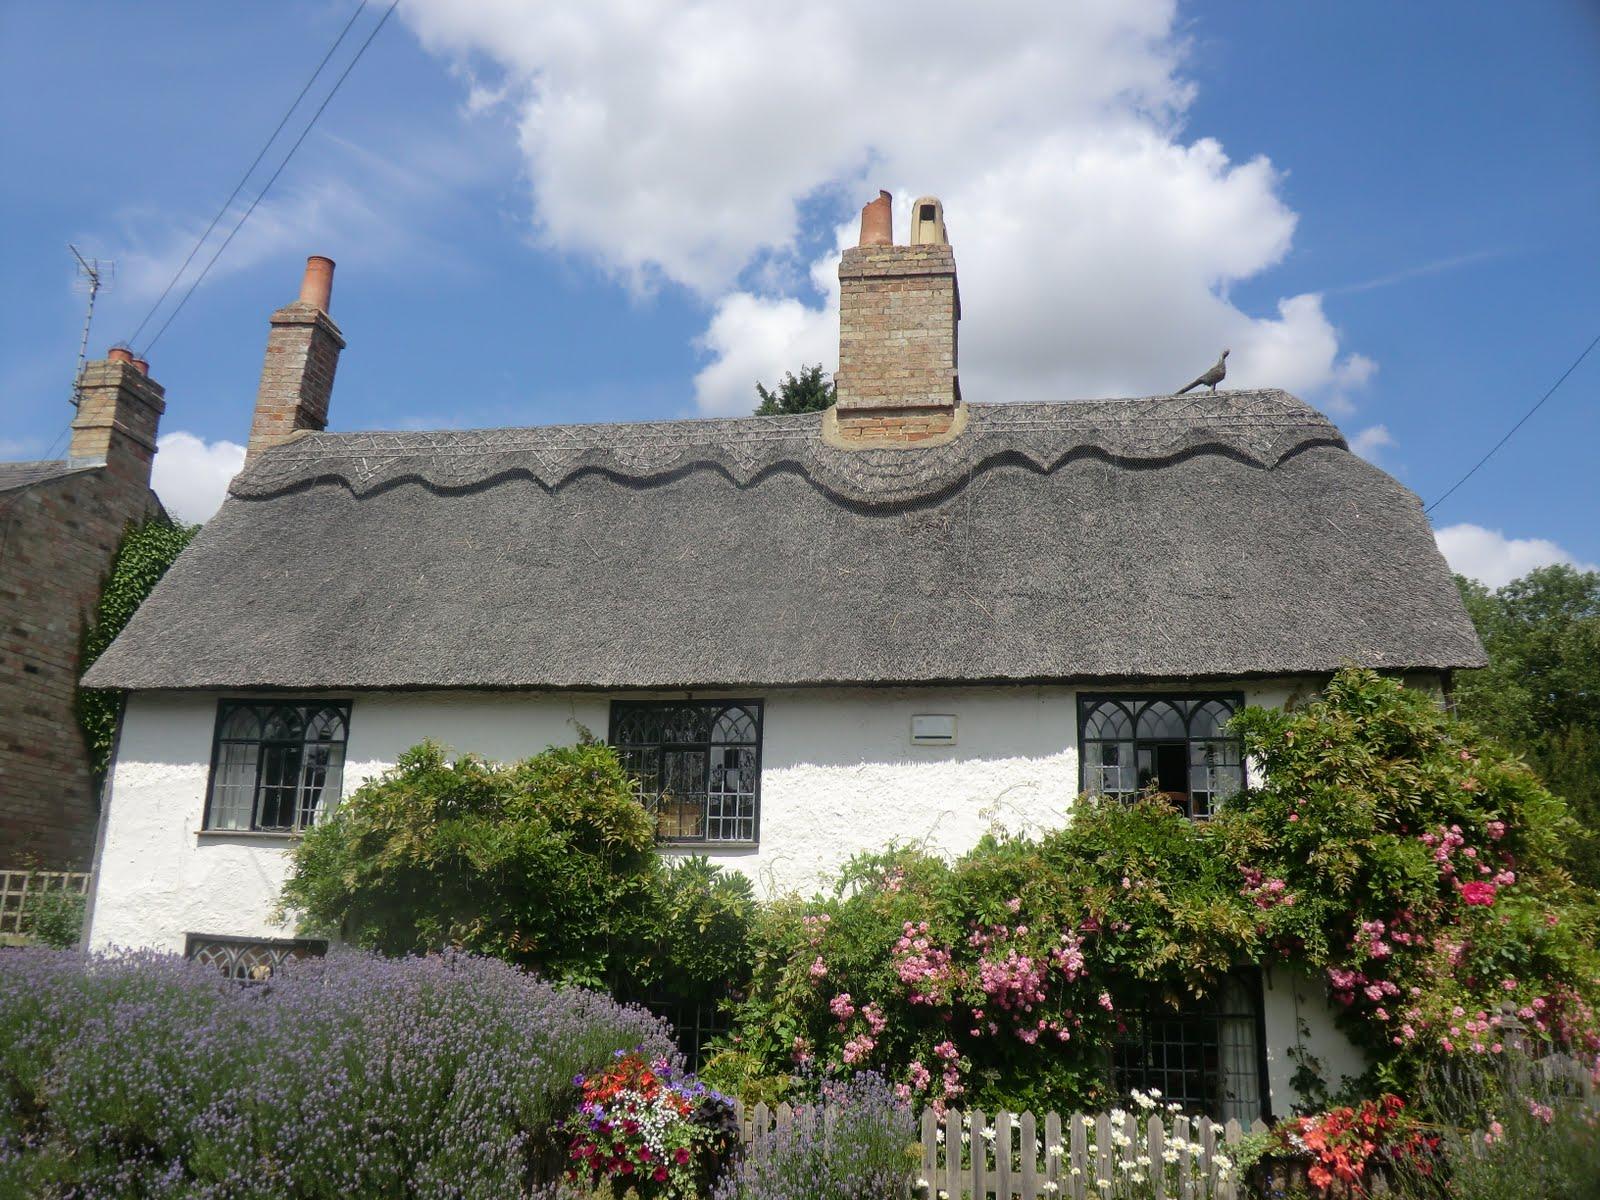 CIMG8914 Cottage, Hemingford Abbots